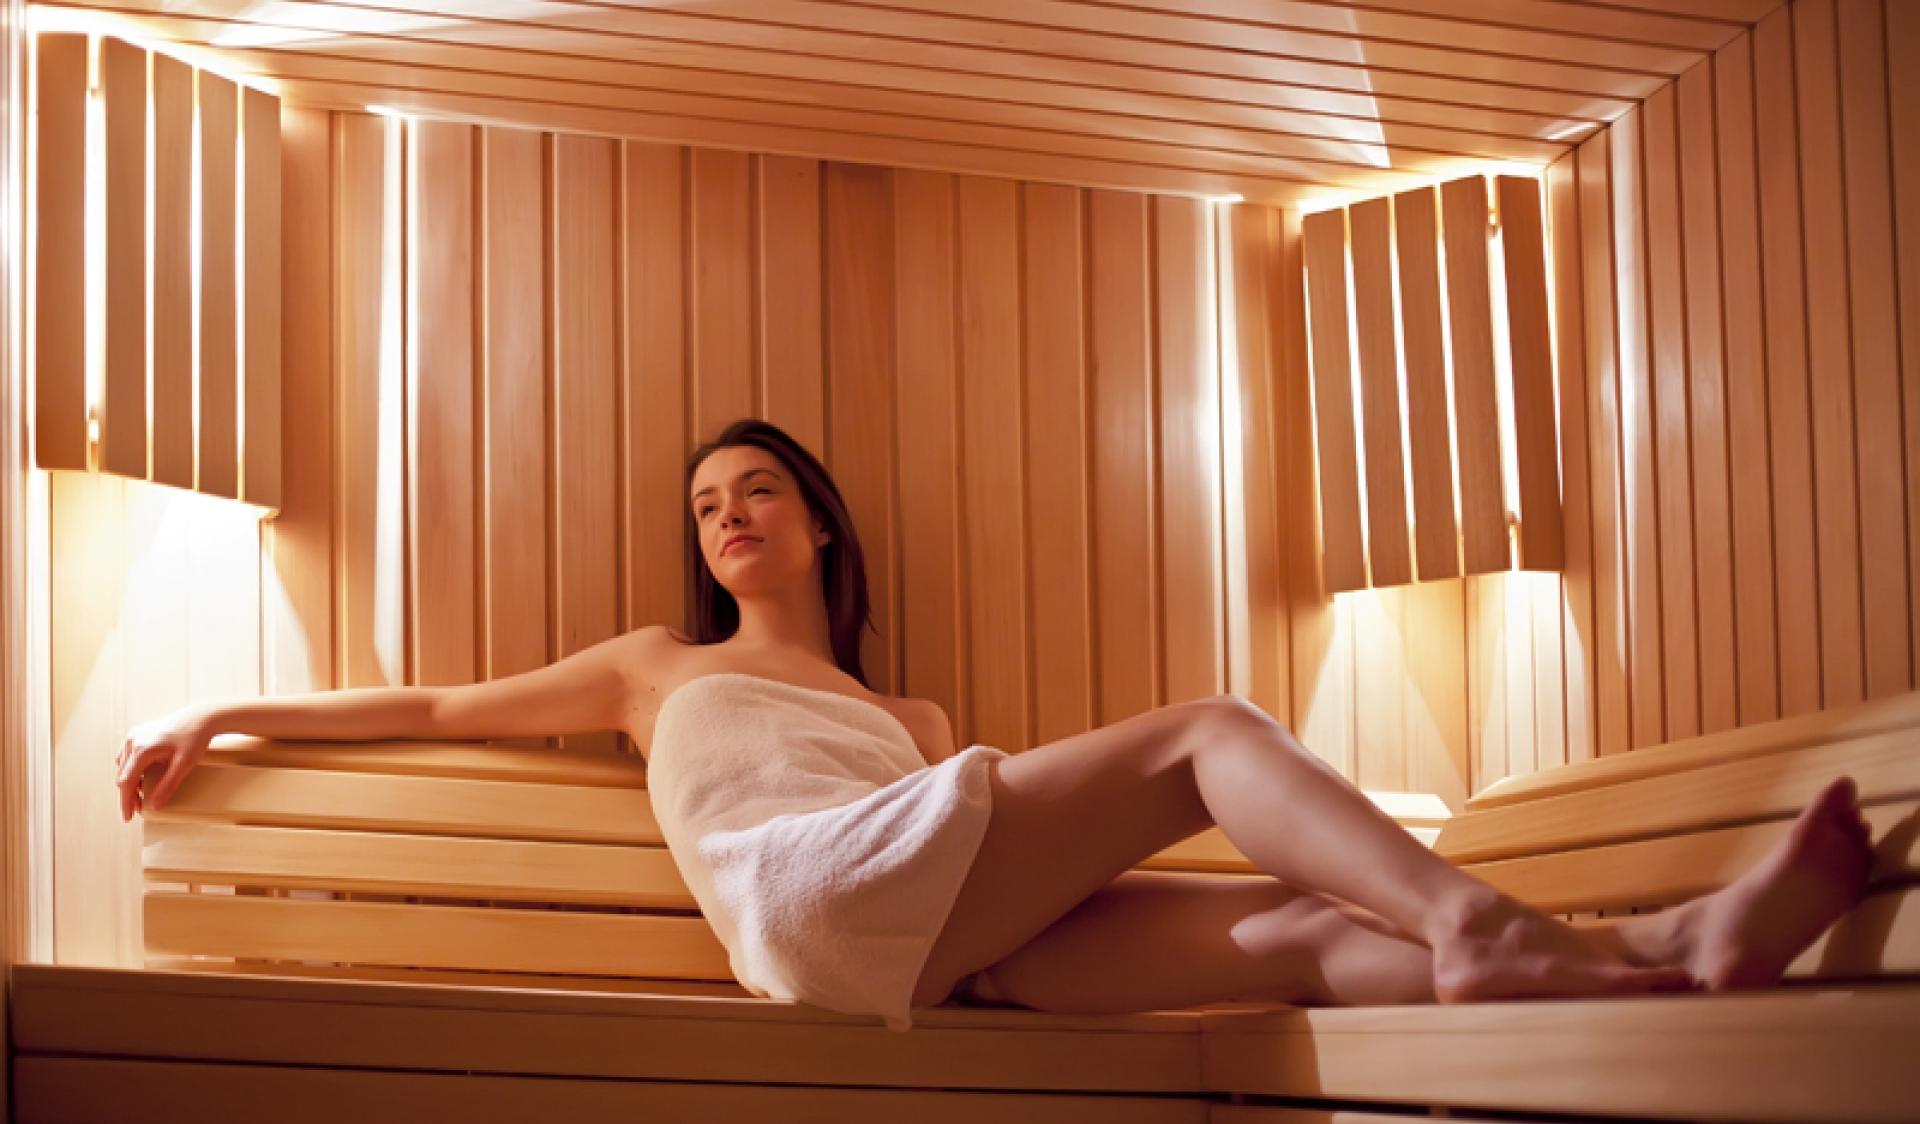 Sauna Benefici Controindicazioni.Sauna Finlandese Benefici E Controindicazioni